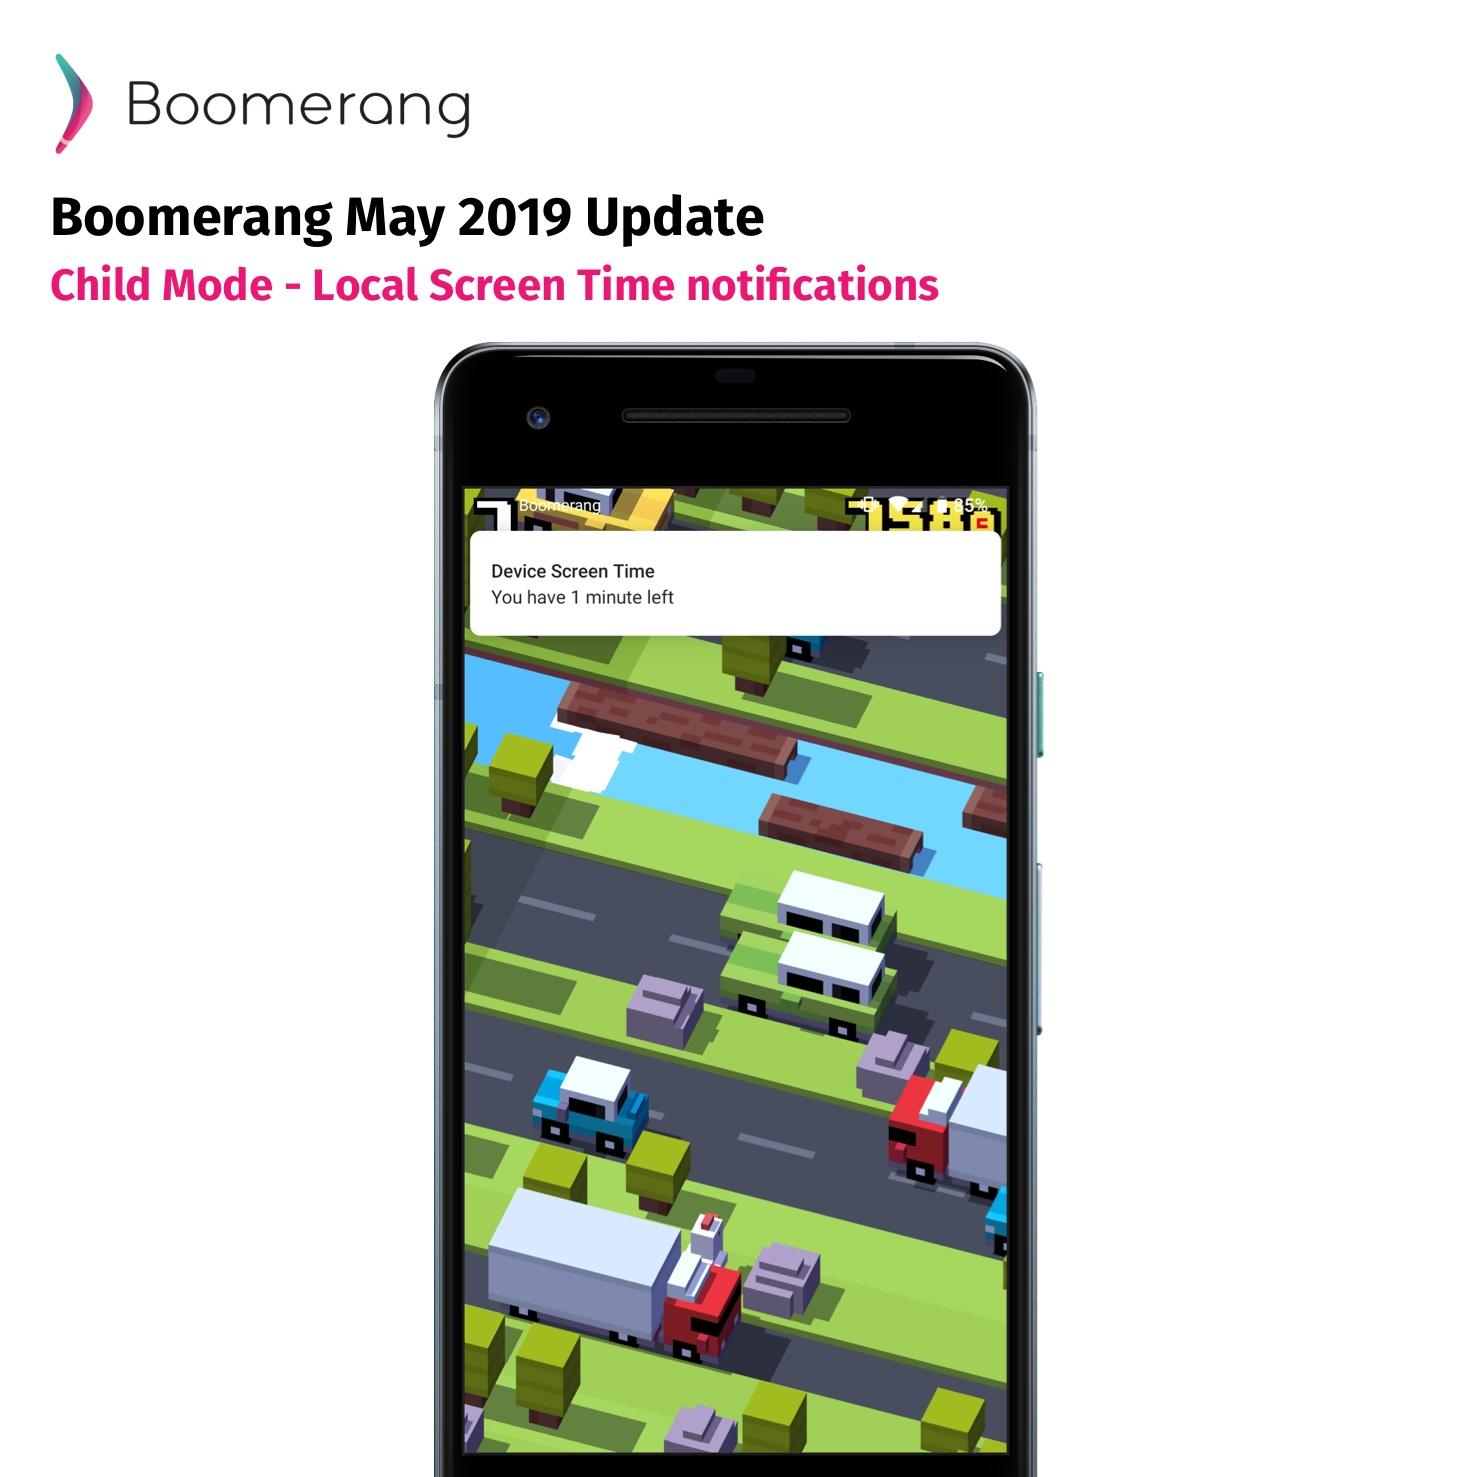 Boomerang May 2019 update